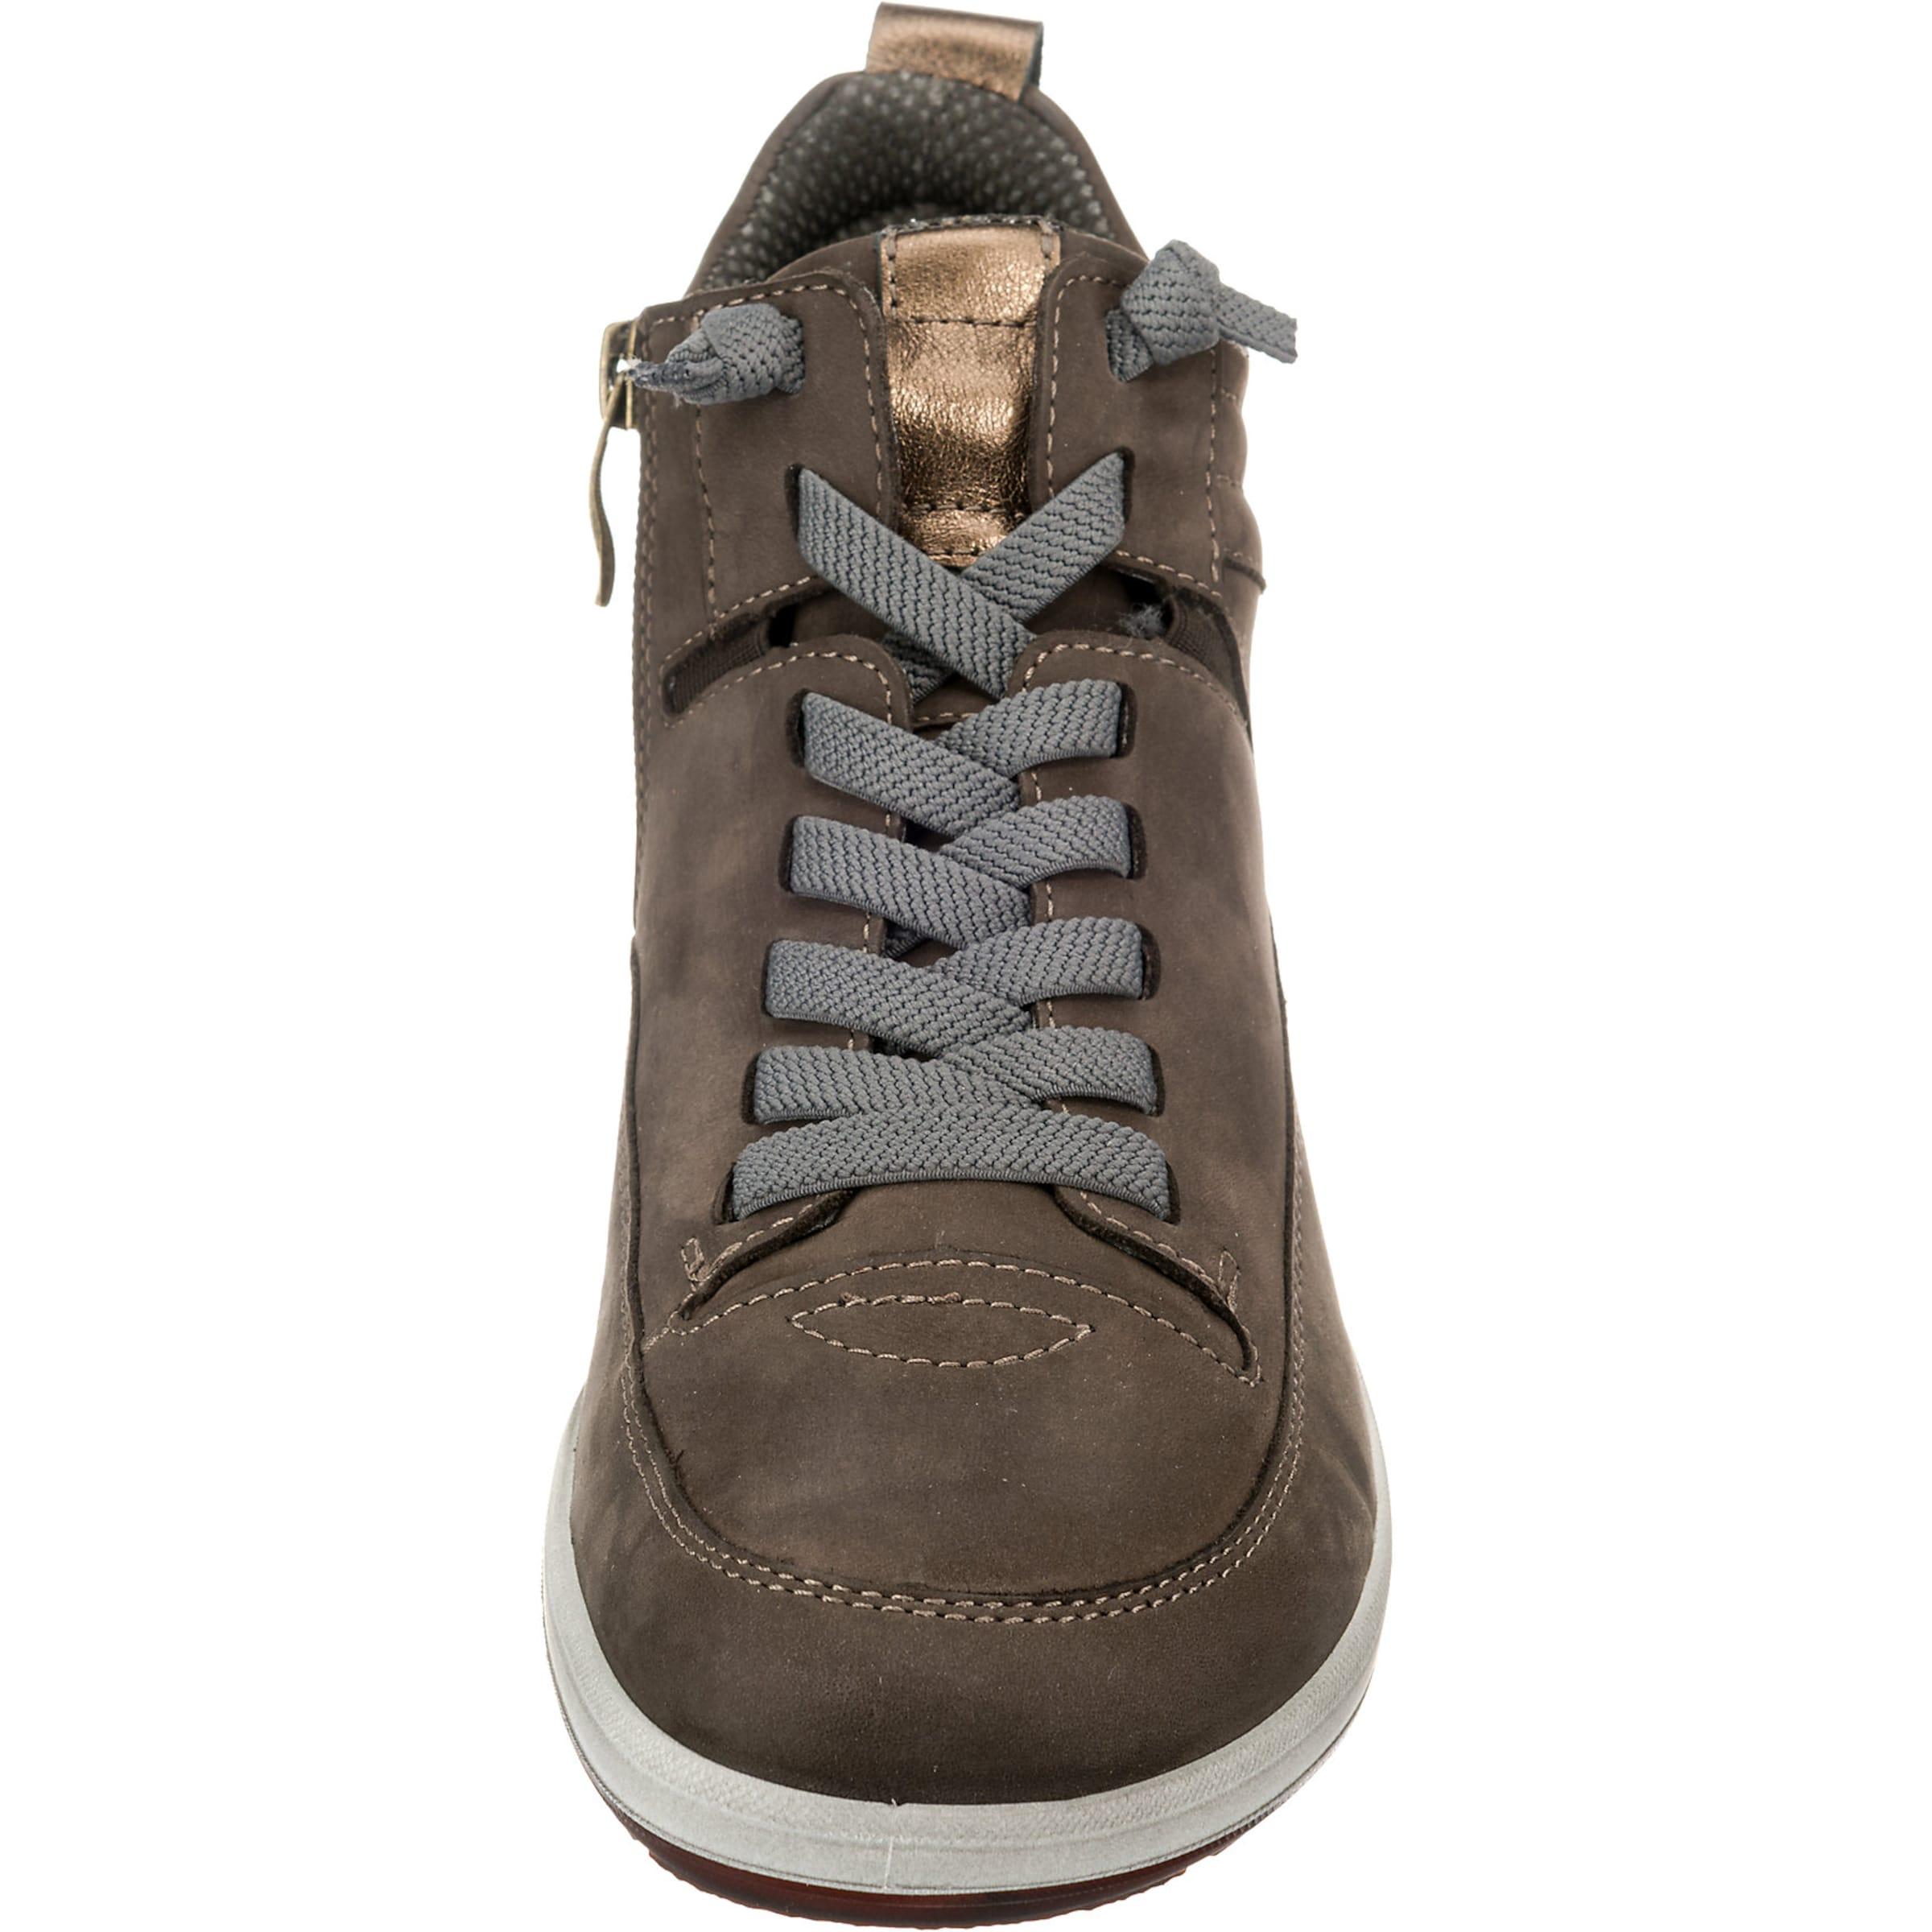 Sneakers In High Ara 'tokio' BrokatGrau f76YvbgyIm